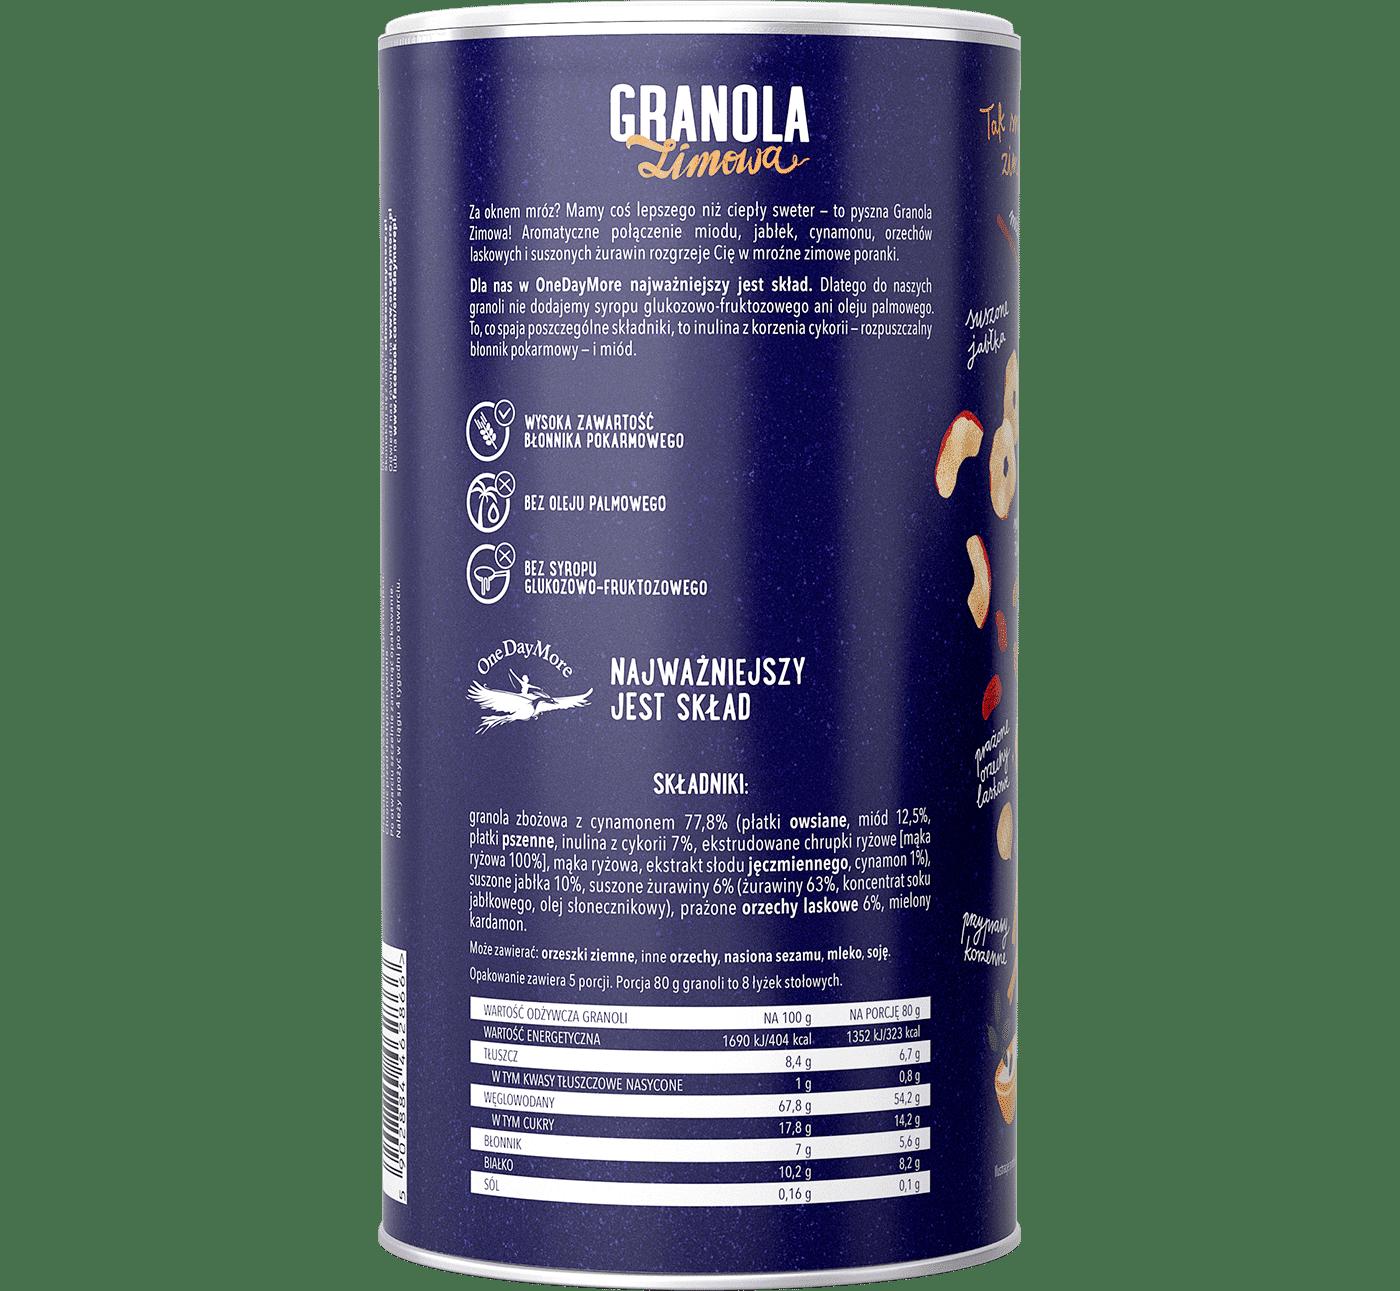 granola-zimowa-onedaymore-tyl-1400×1291